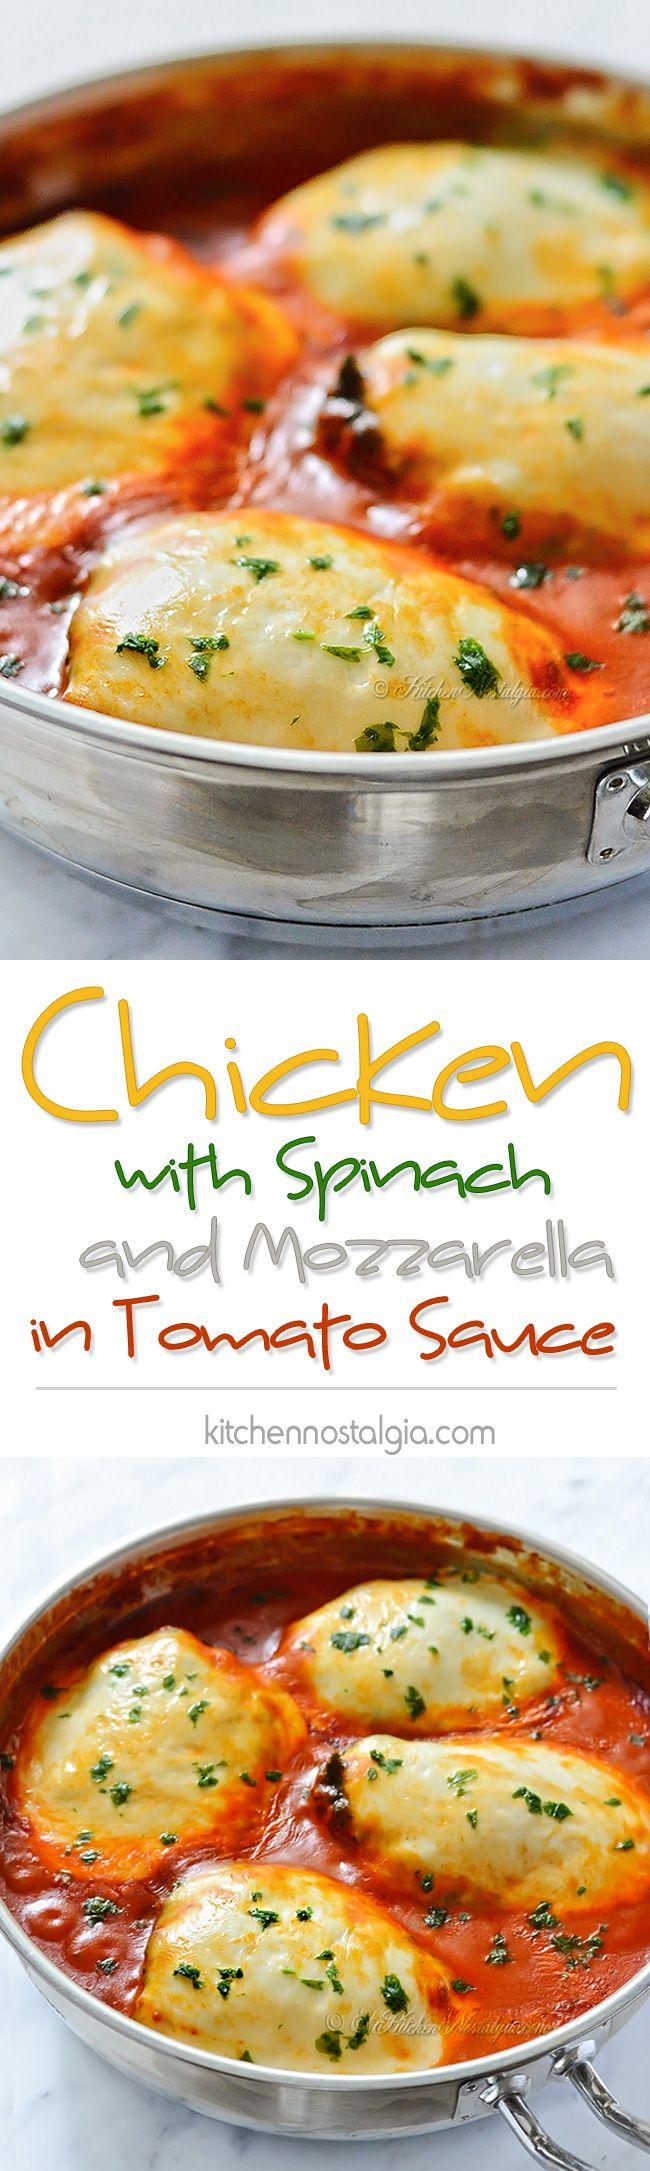 Chicken with Spinach and Mozzarella in Tomato Sauce